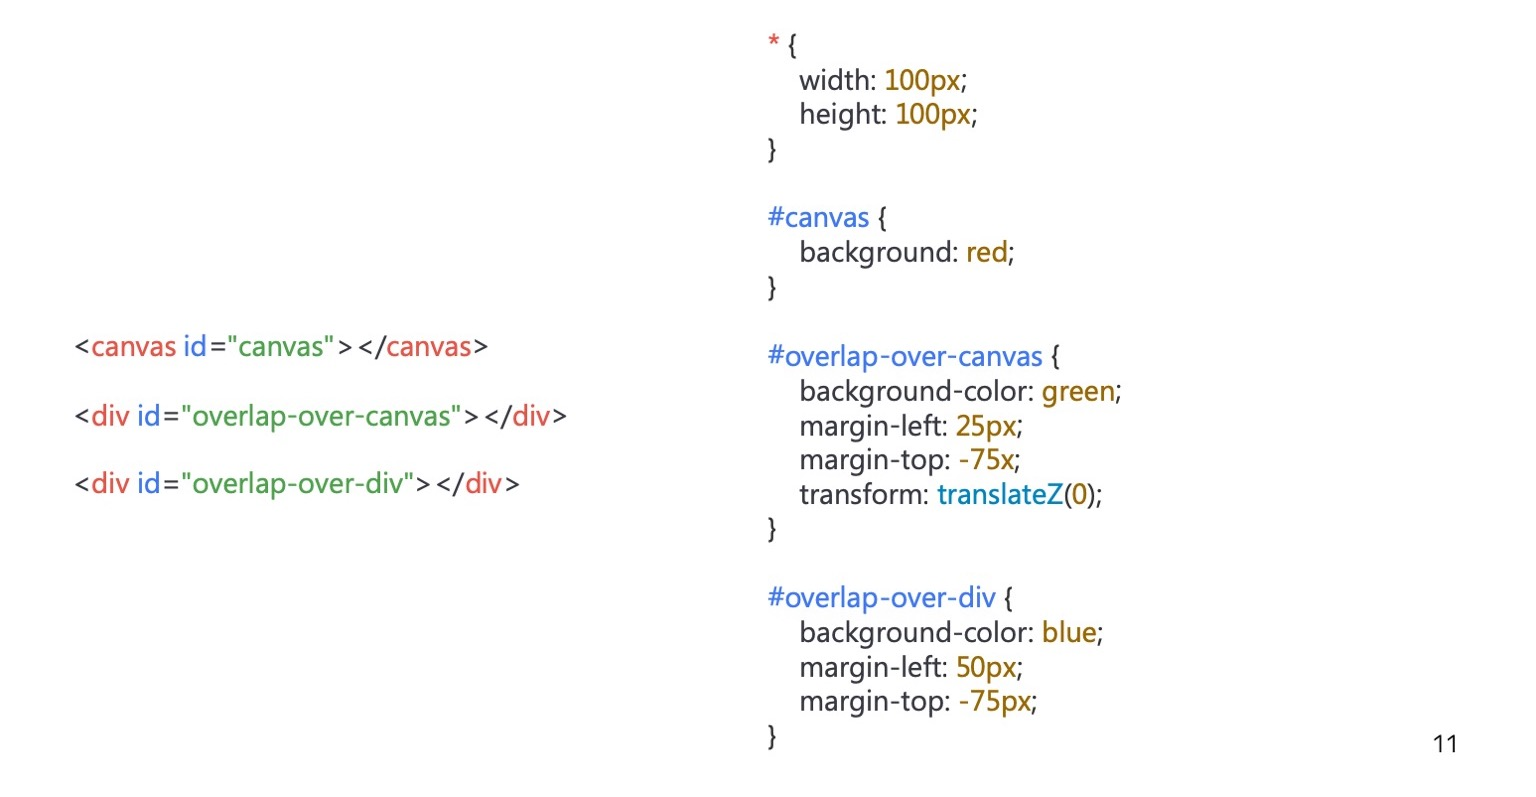 Как рисует браузер. Доклад Яндекса - 12